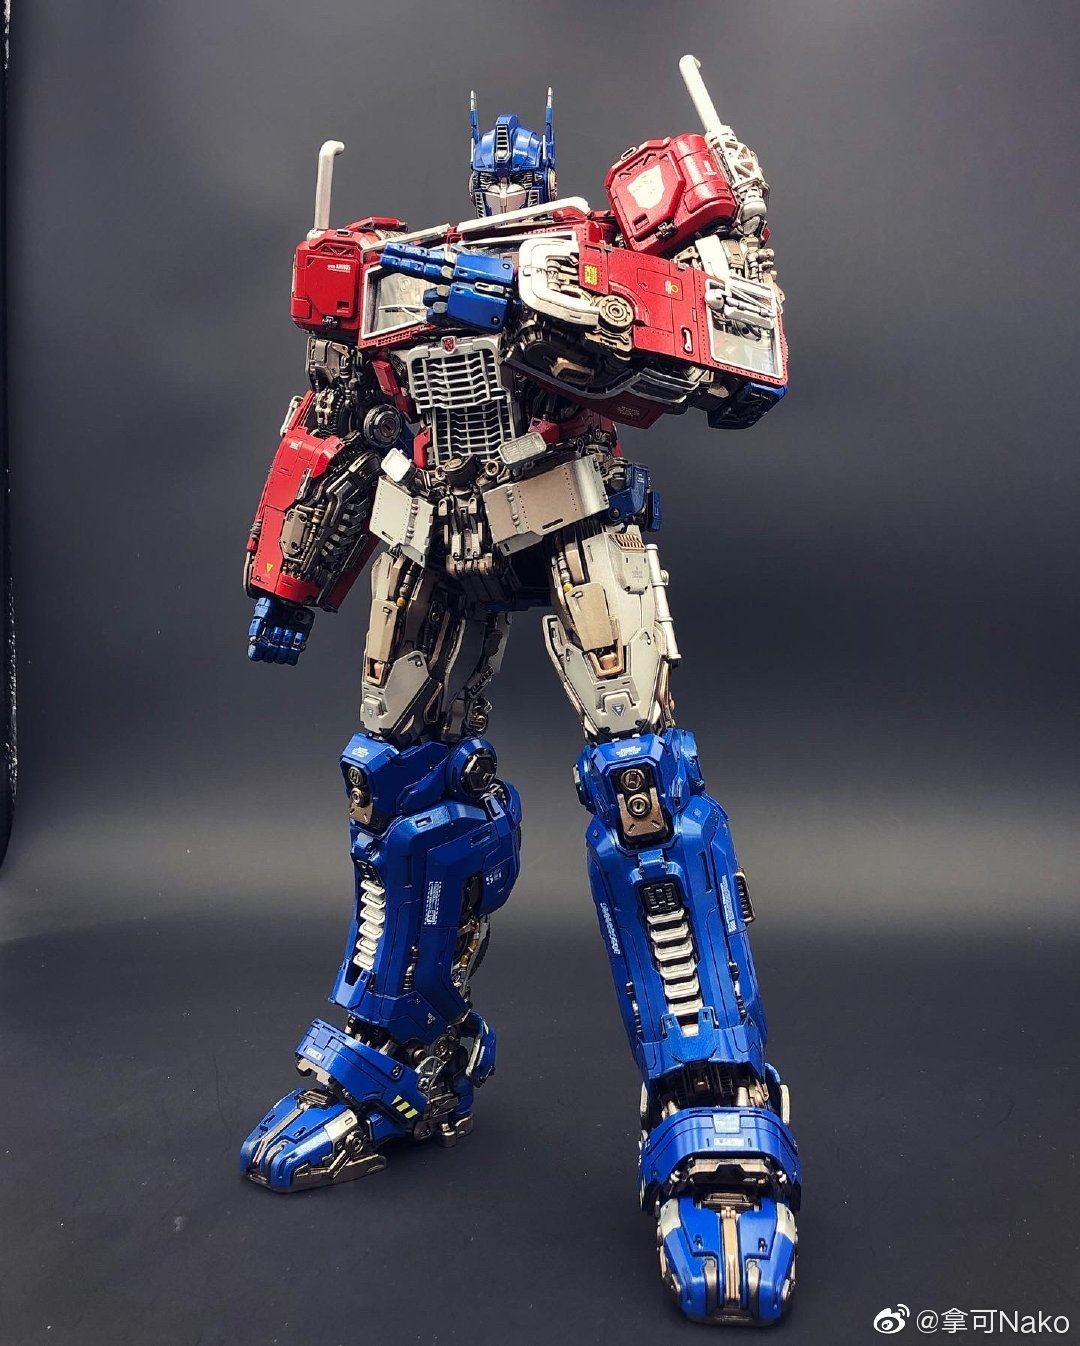 G798_NakoMake_Optimus_Prime_BUMBLEBEE_ver_GK_036.jpg